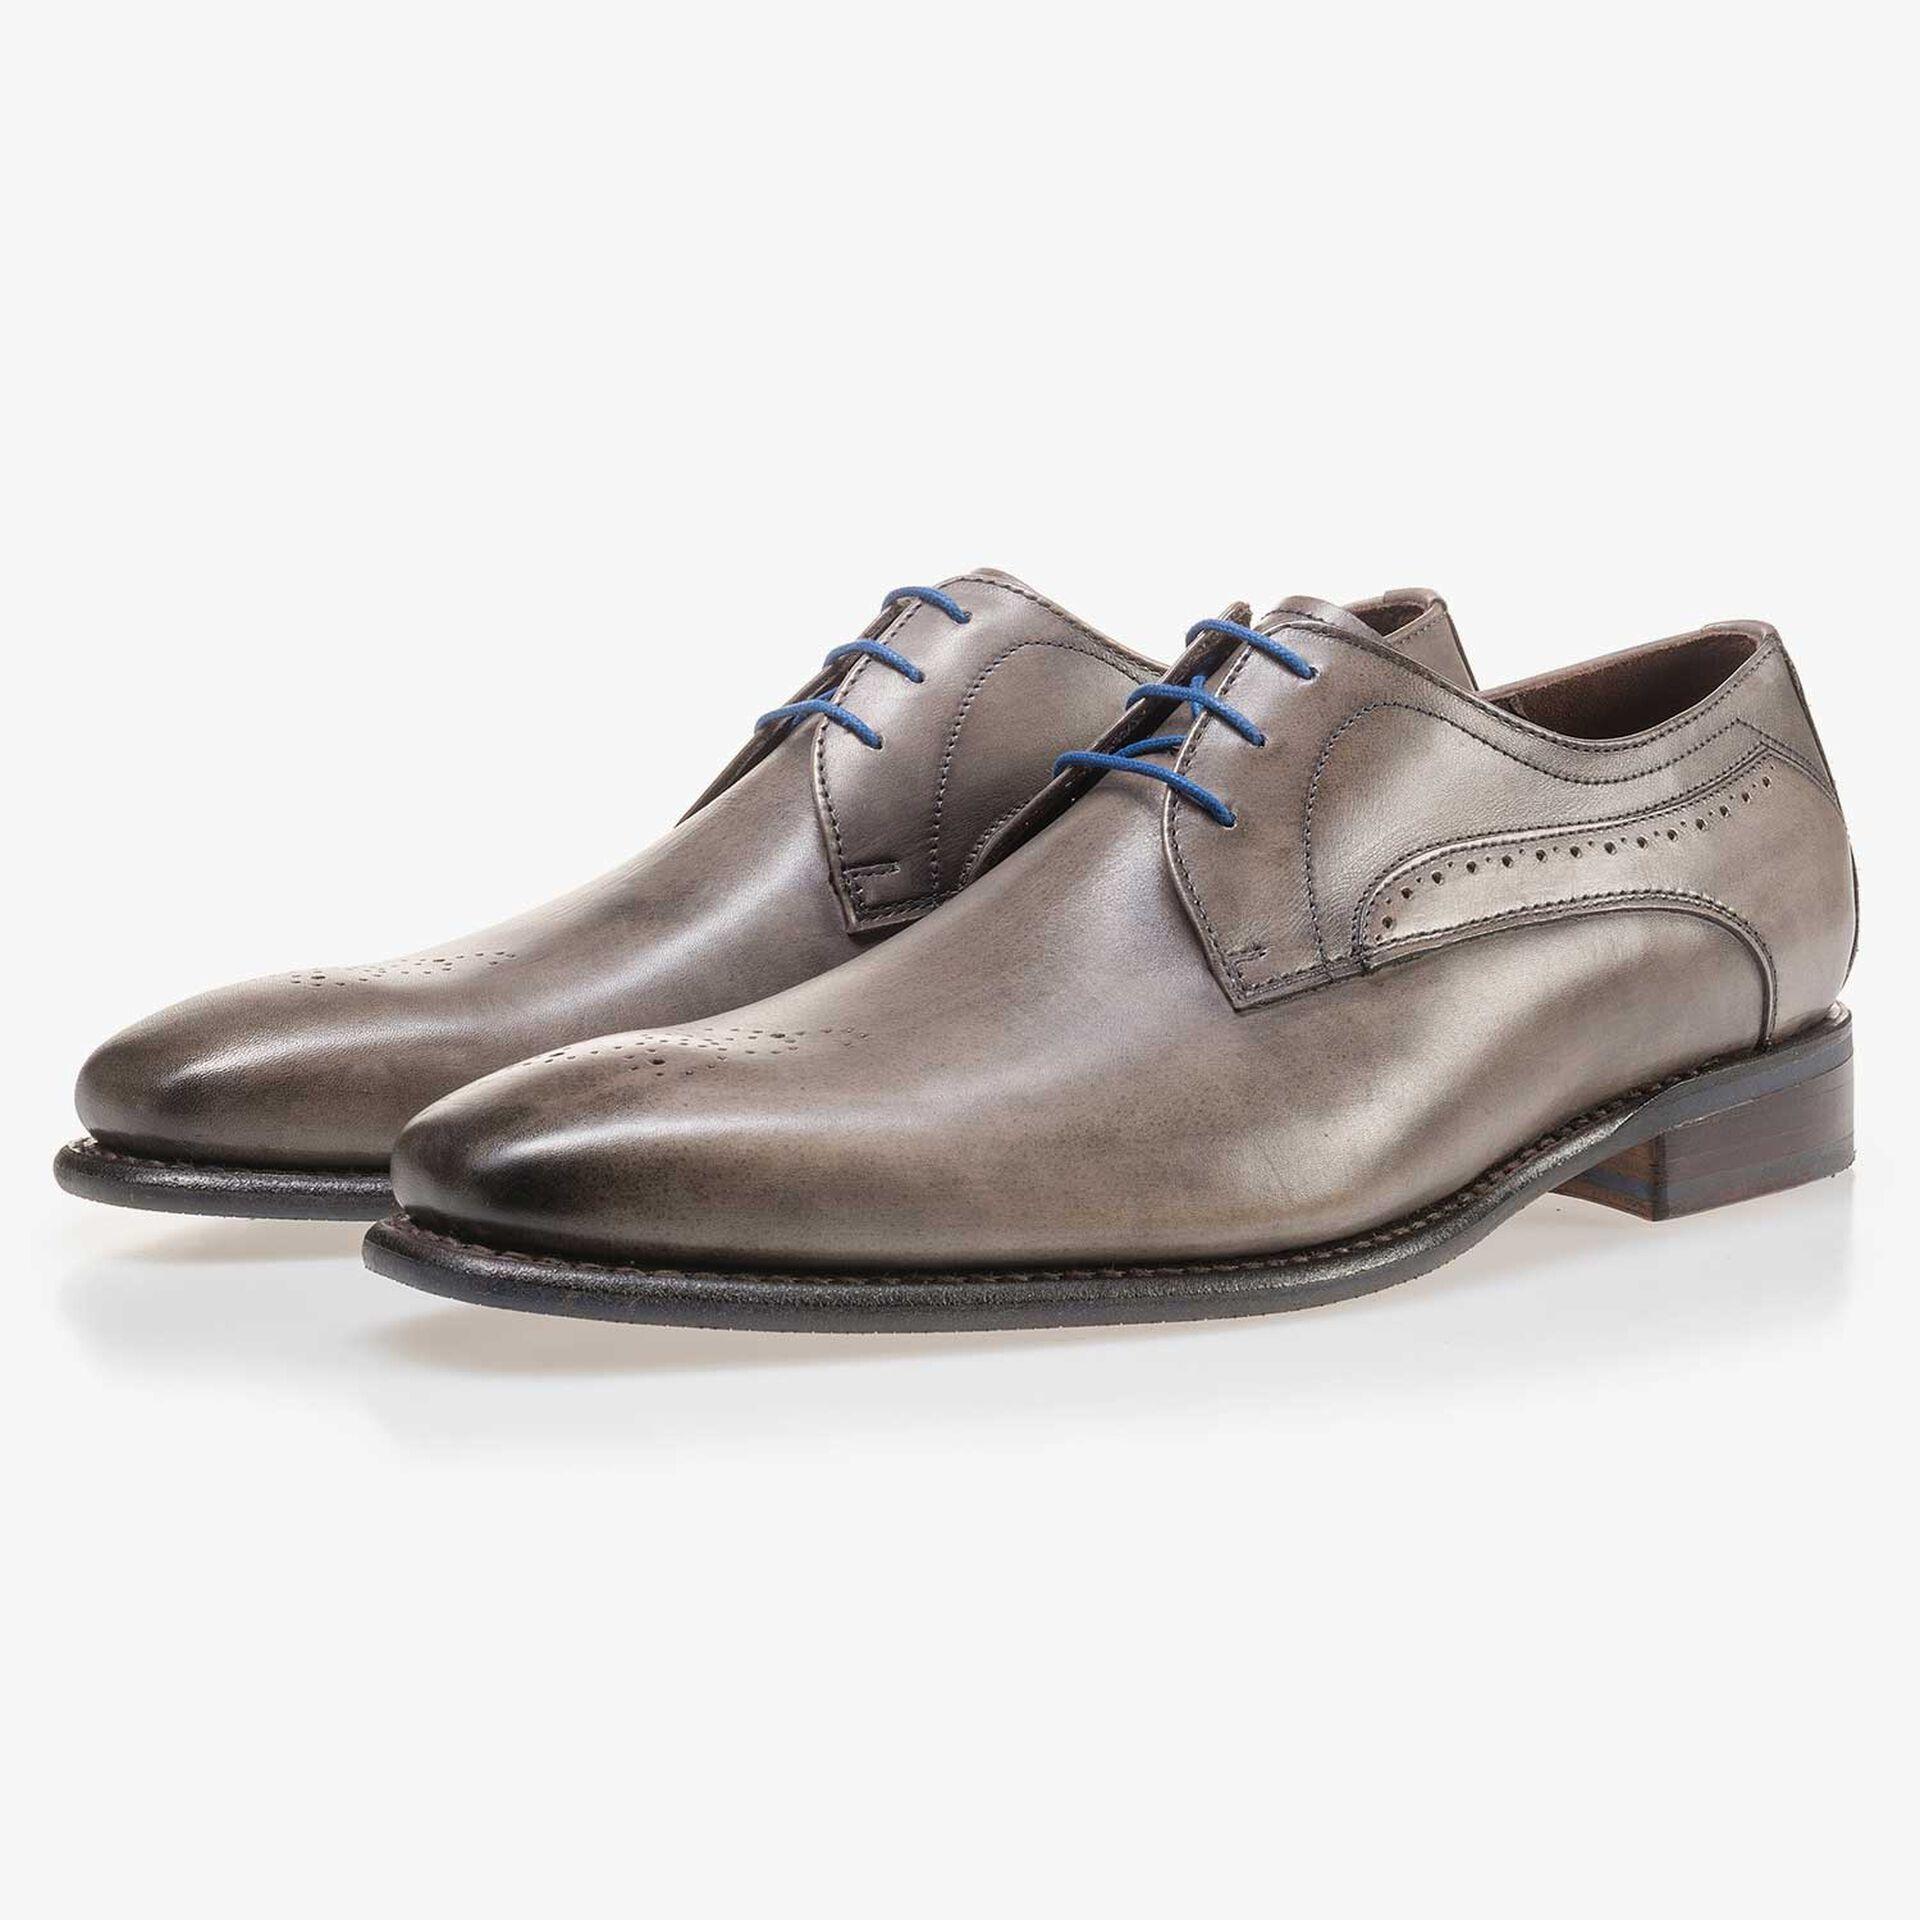 Taupe-coloured calf's leather lace shoe